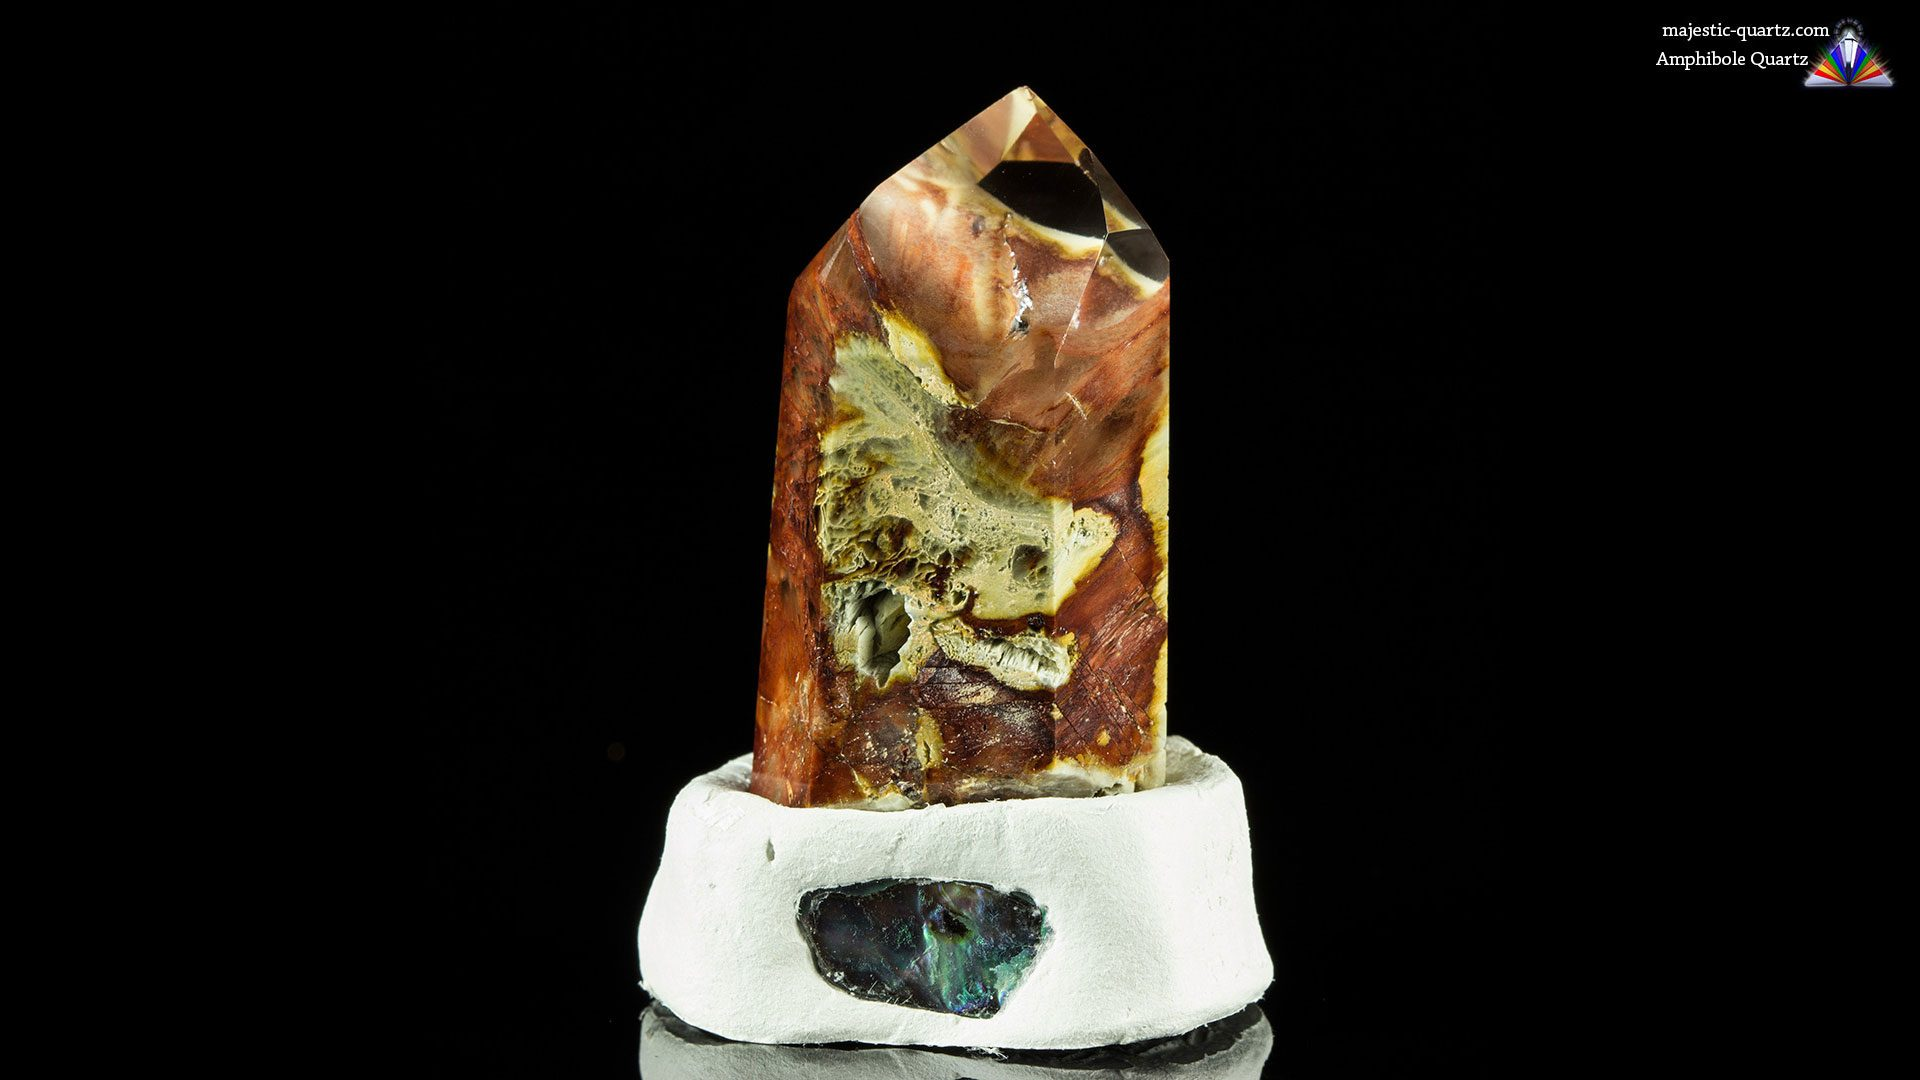 Amphibole Quartz Crystal Specimen - Photograph by Anthony Bradford